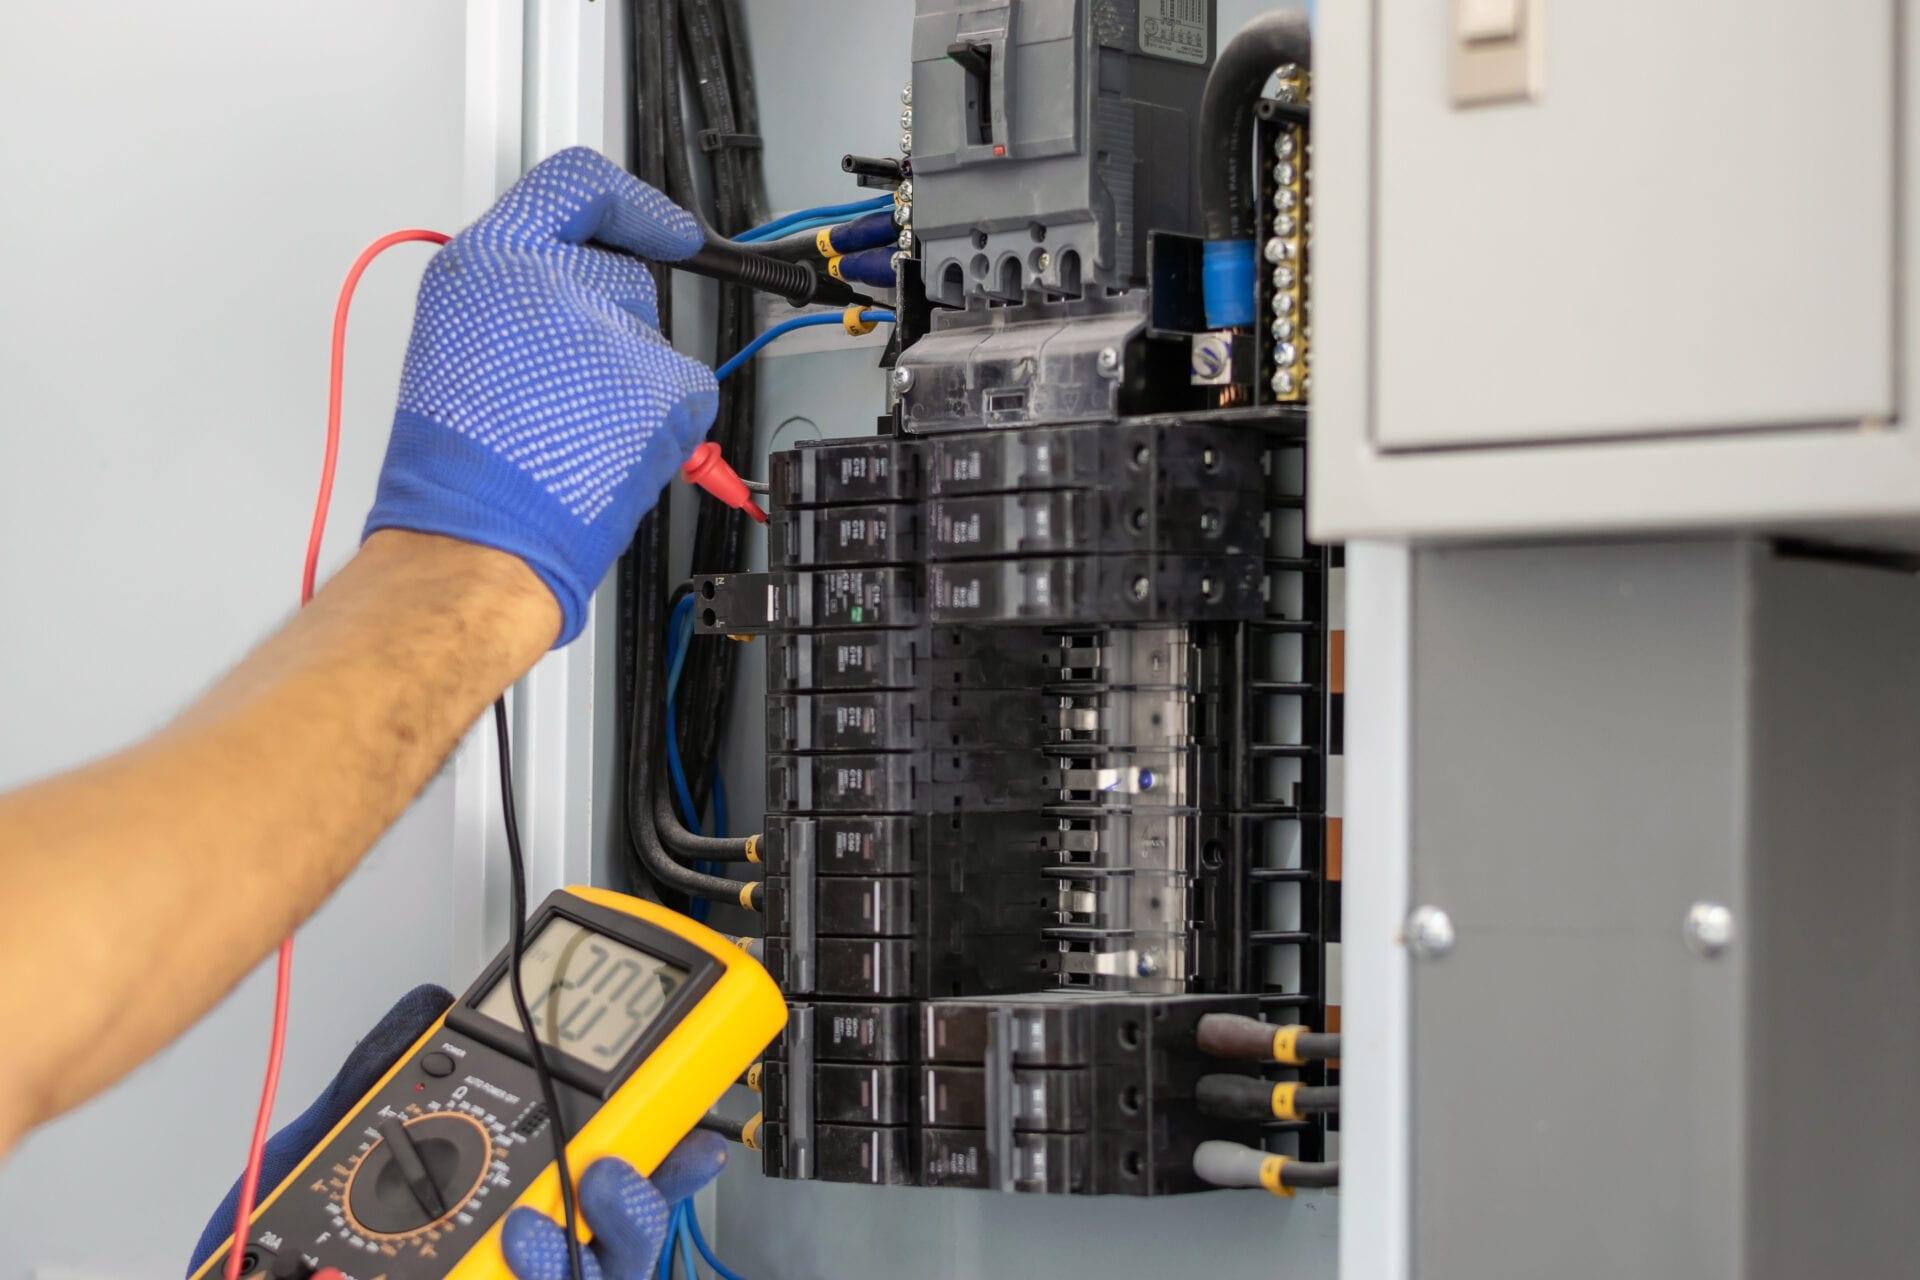 Electrician repairing electrical panel